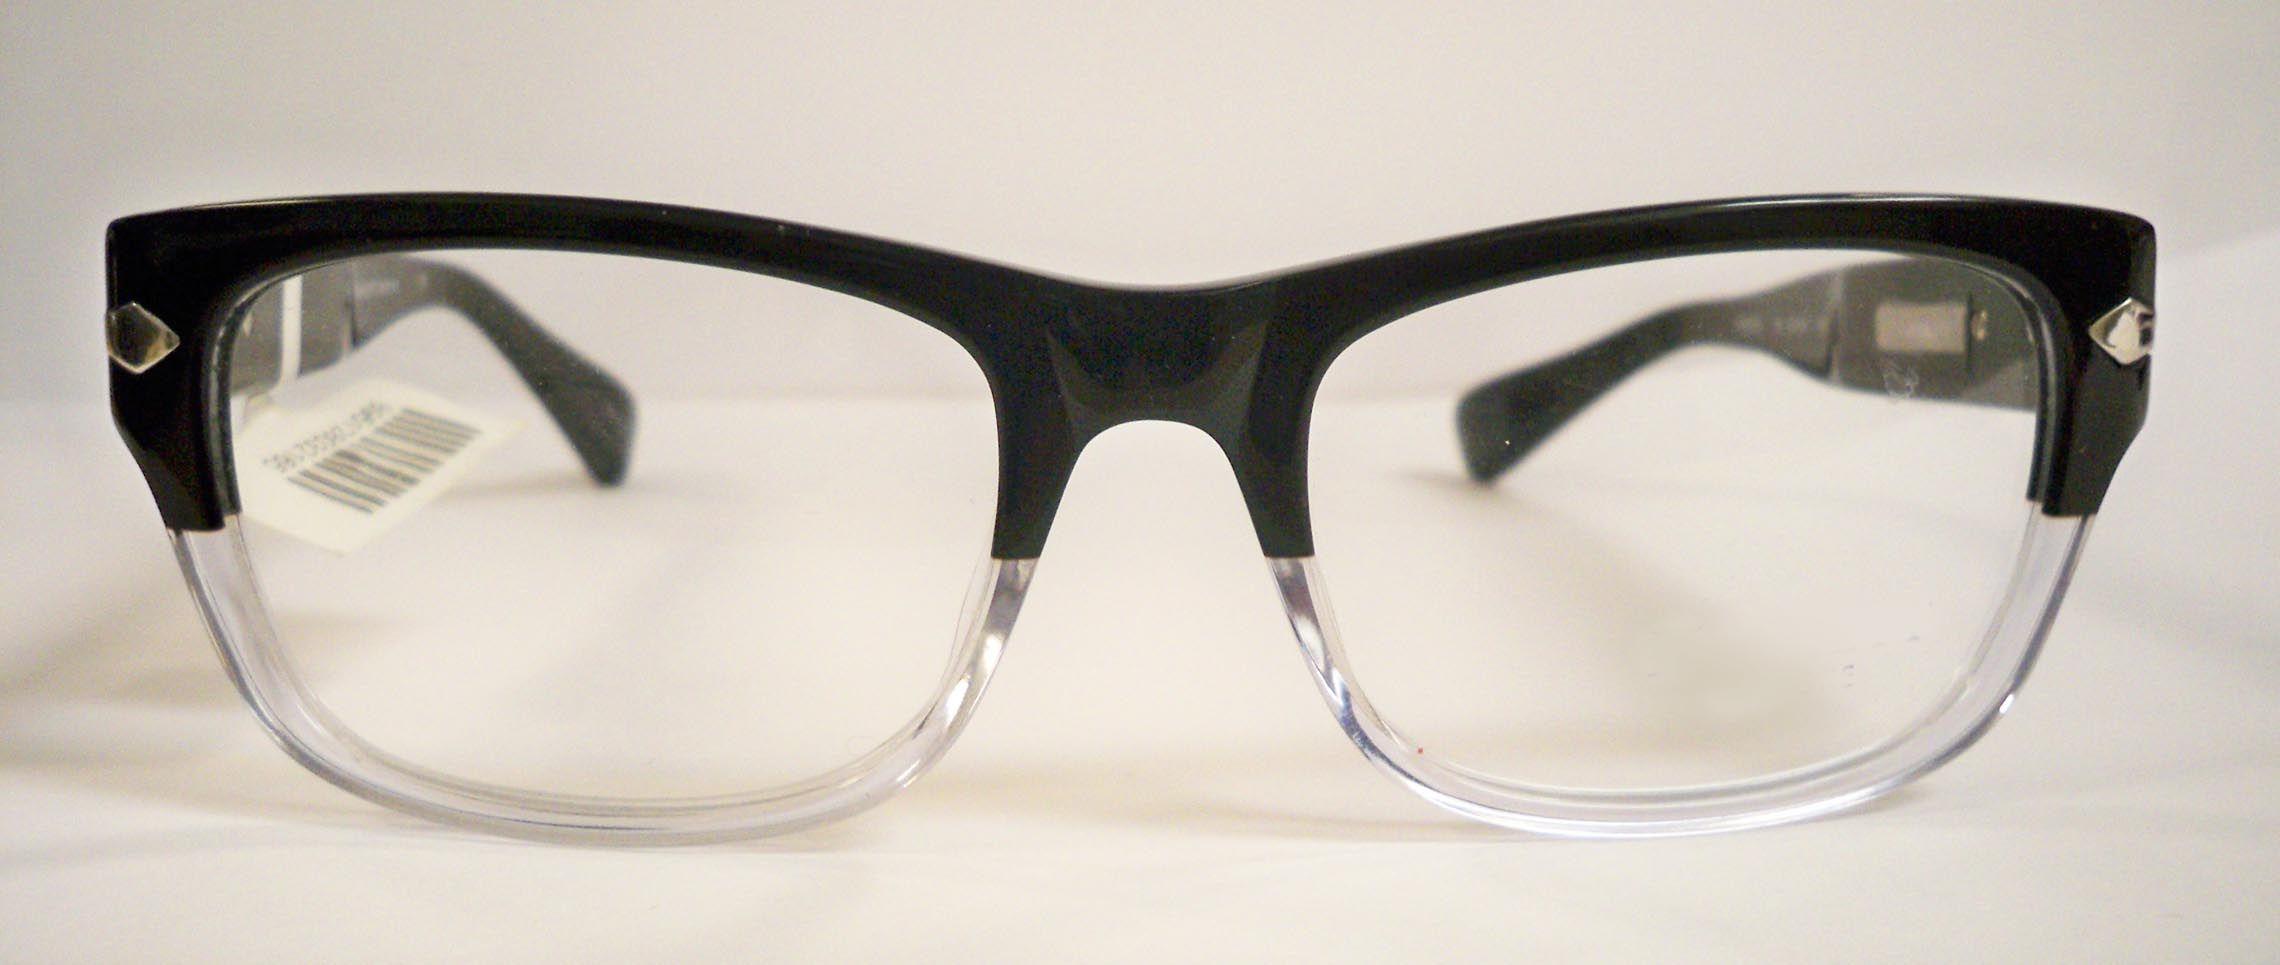 pearlevision roswell ga georgia acetate acetateframes frames glasses - Zyl Frames